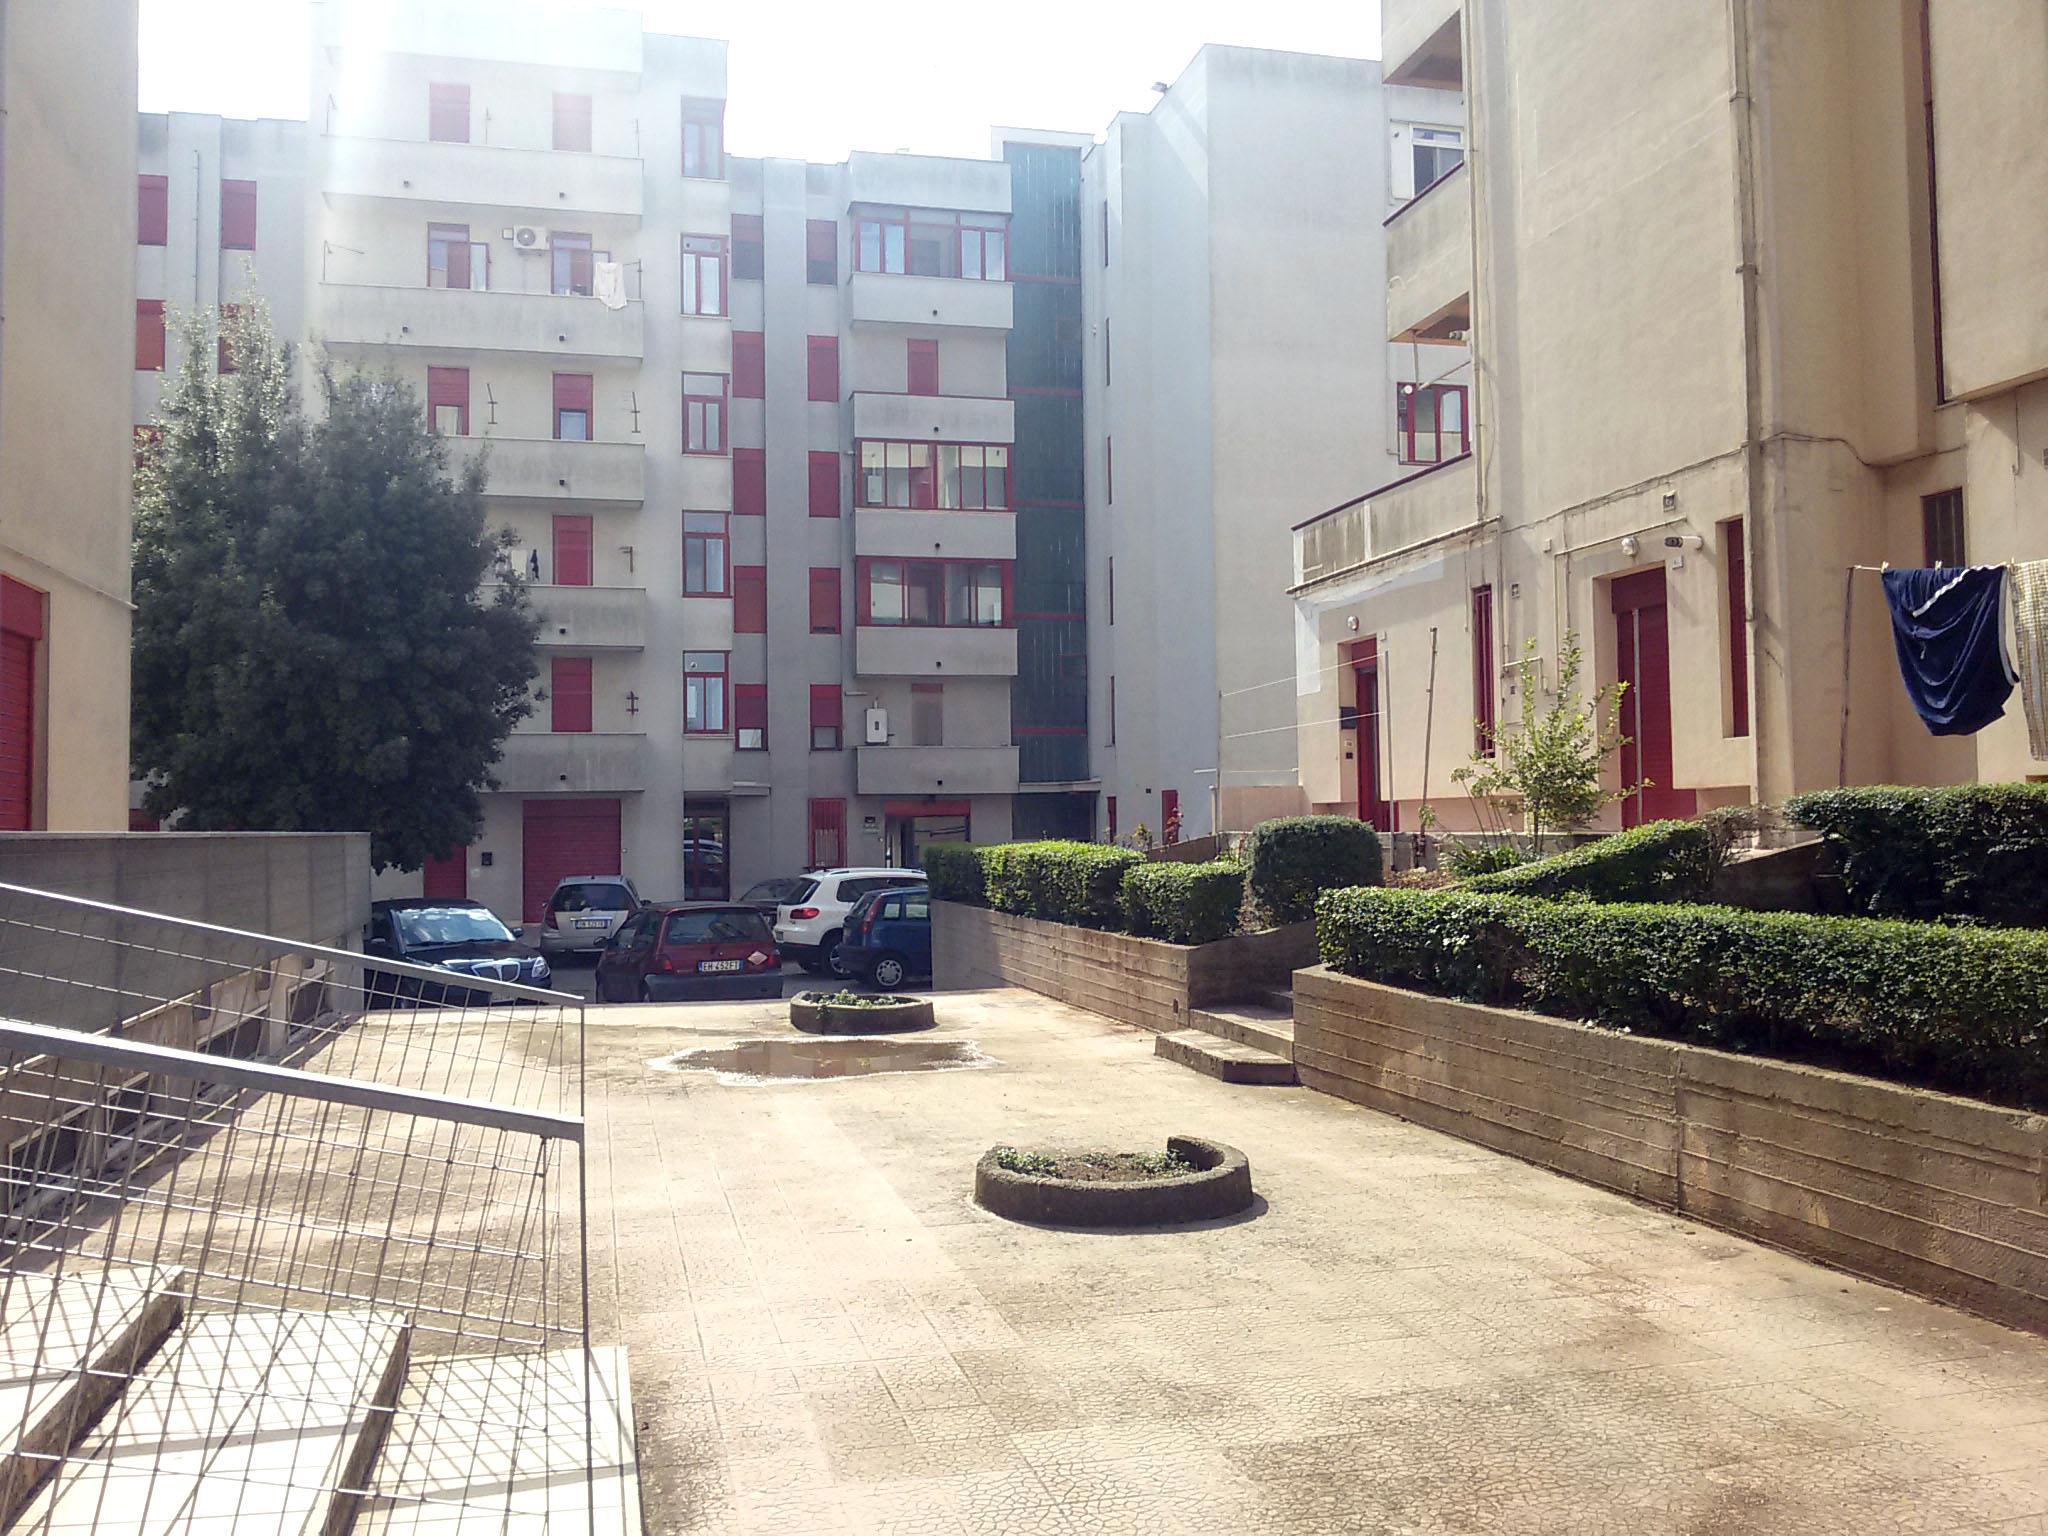 208 – Appartamento – via Pietro del Tocco – Martina Franca